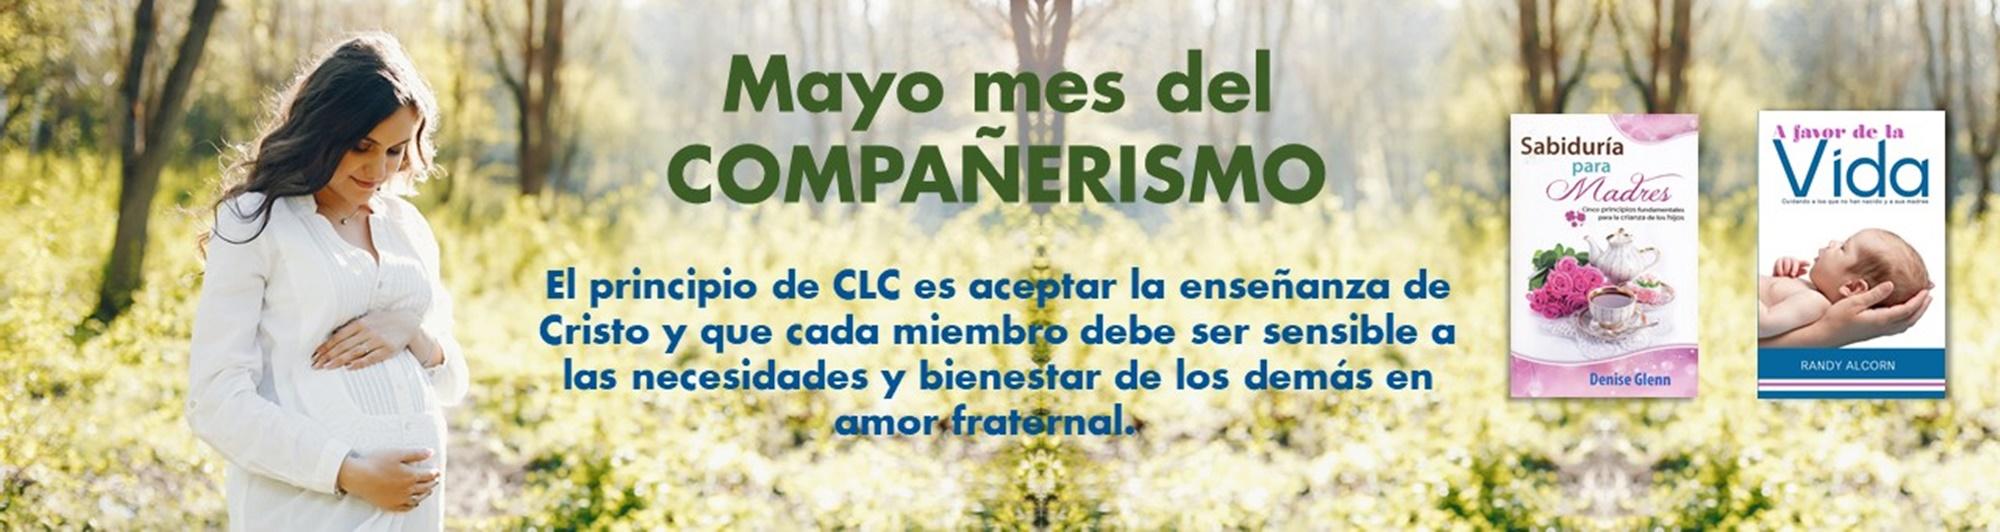 plantilla web mayo 2020 (1)